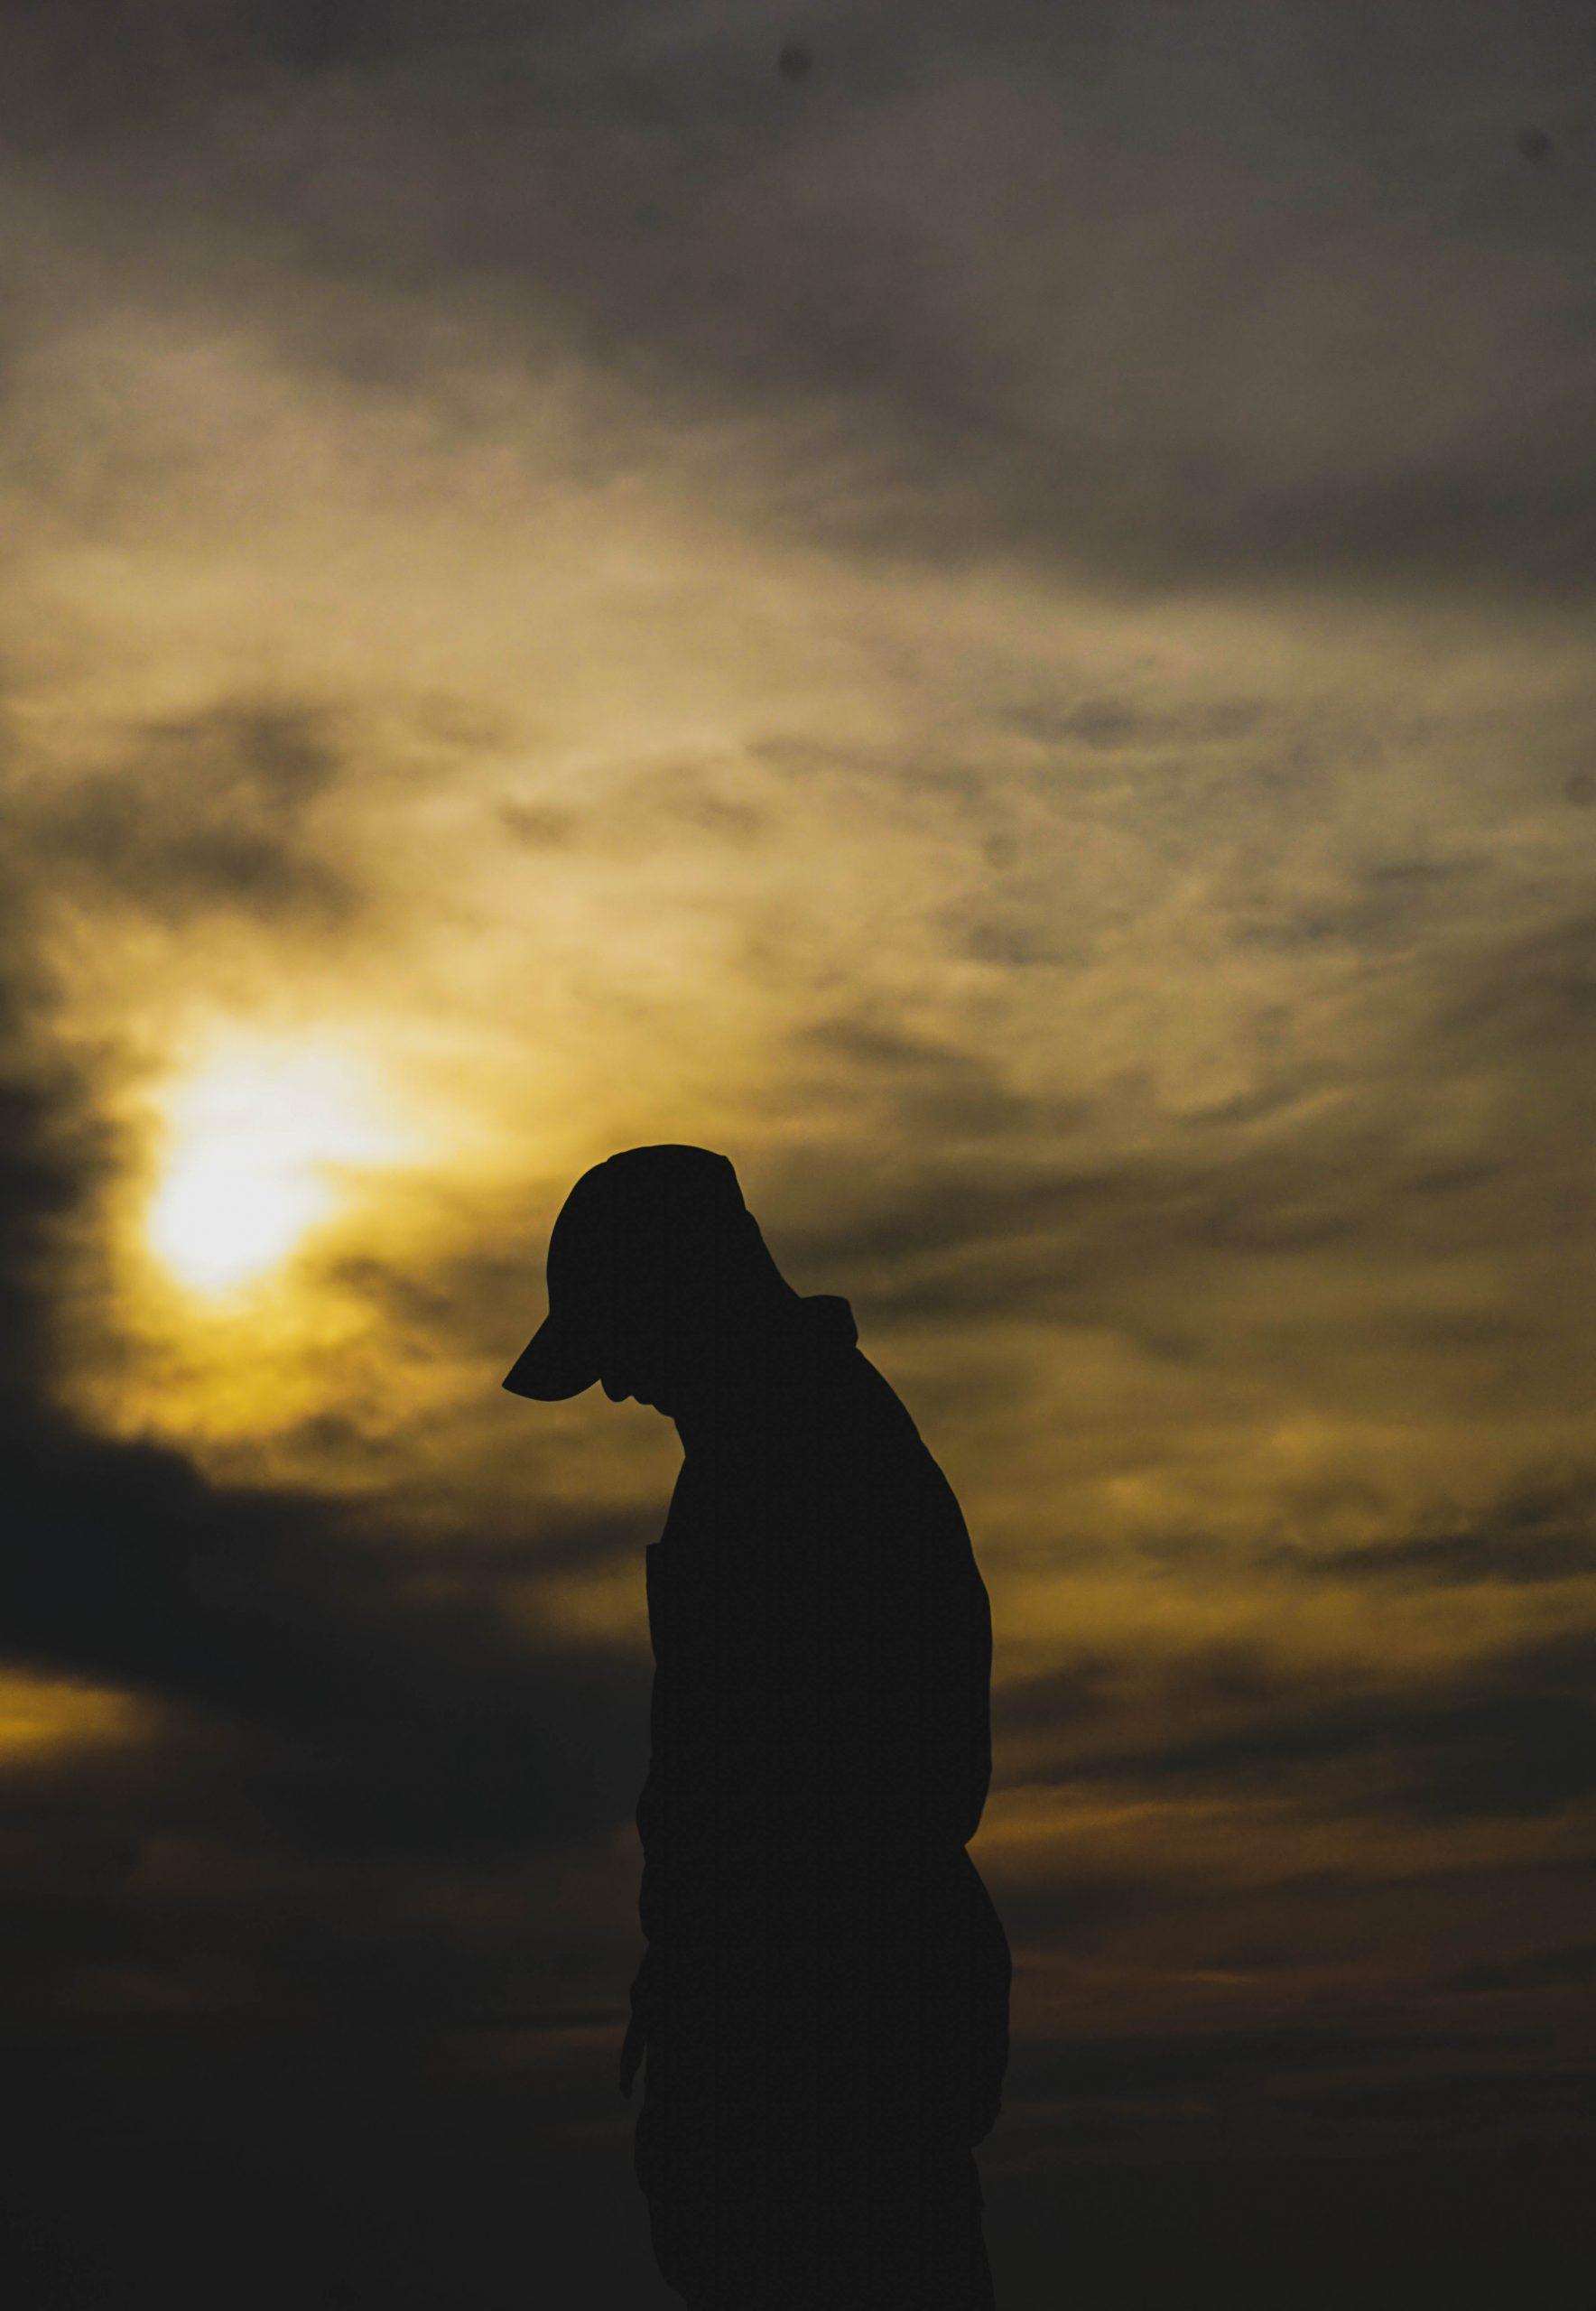 A boy during sunset